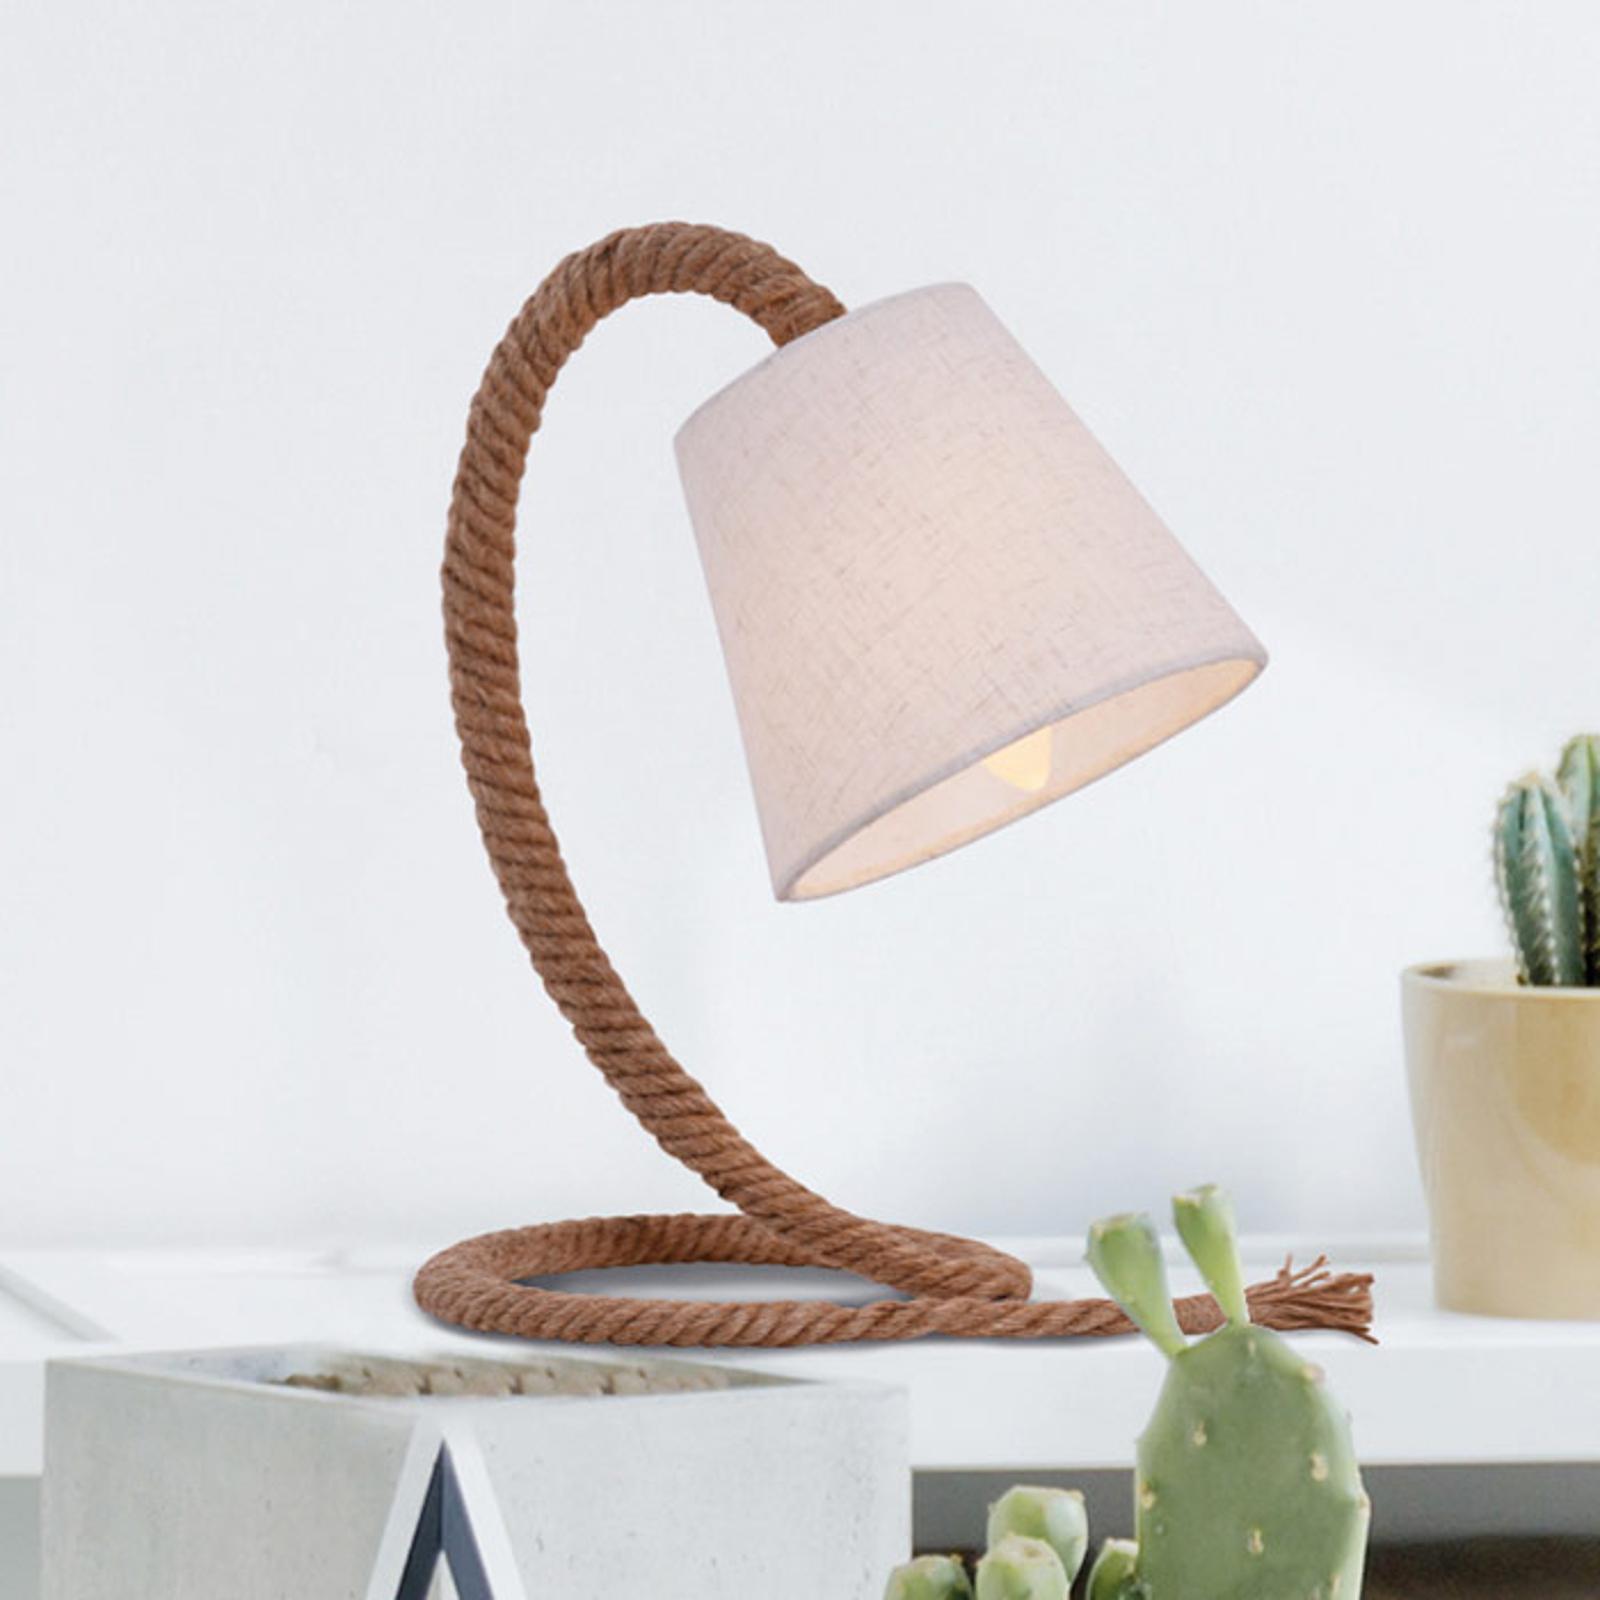 Pöytälamppu Rope, tekstiilivarjostin, luonnonköysi